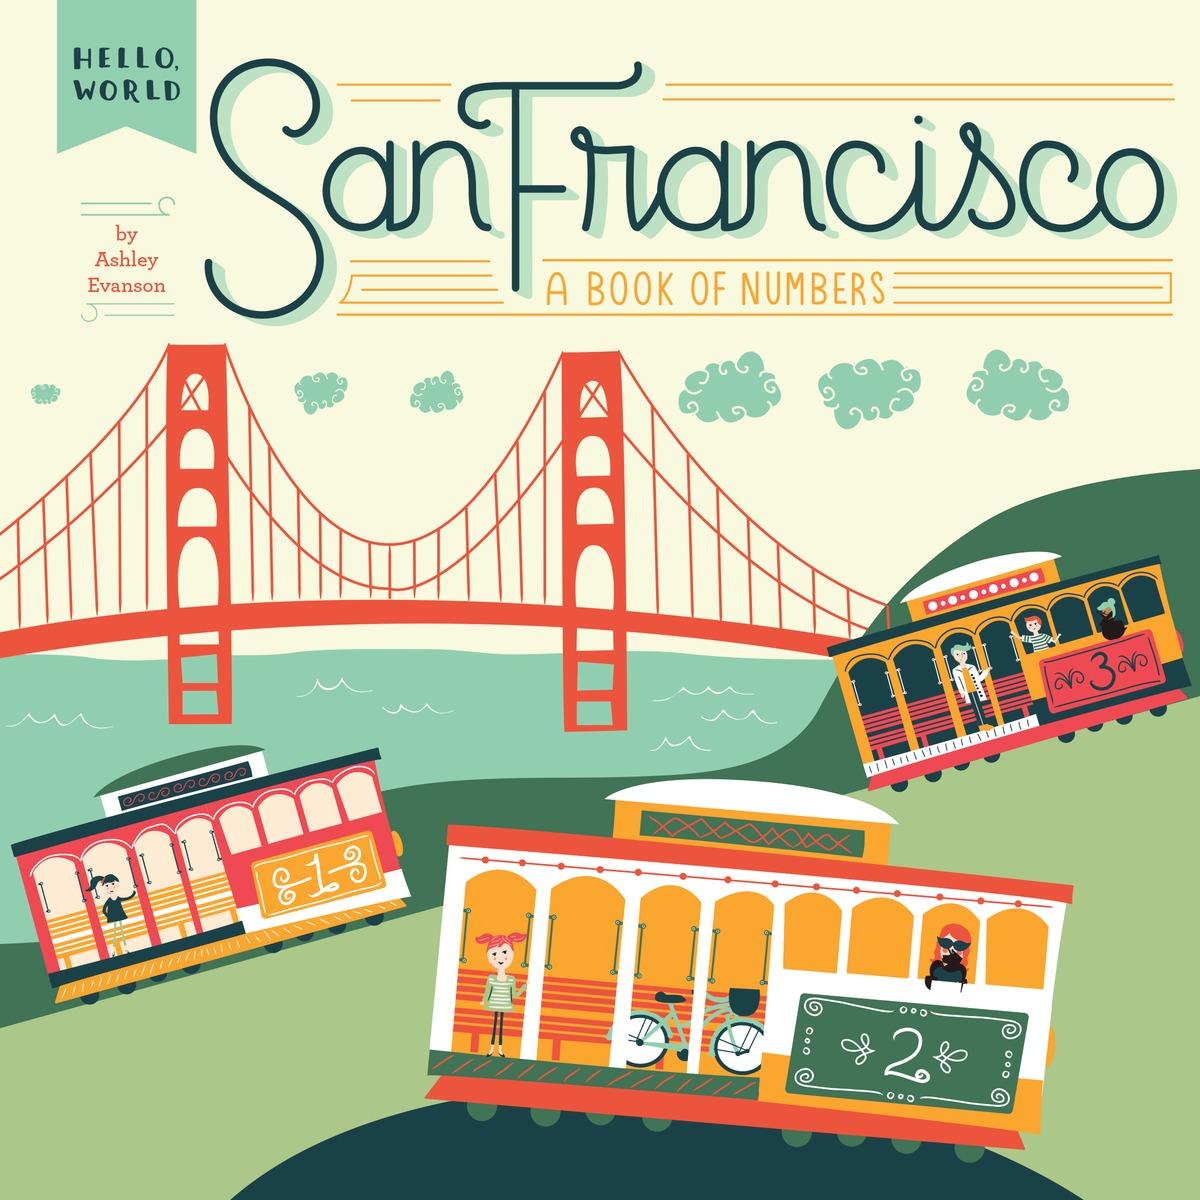 EVANSON, ASHLEY HELLO, WORLD: SAN FRANCISCO